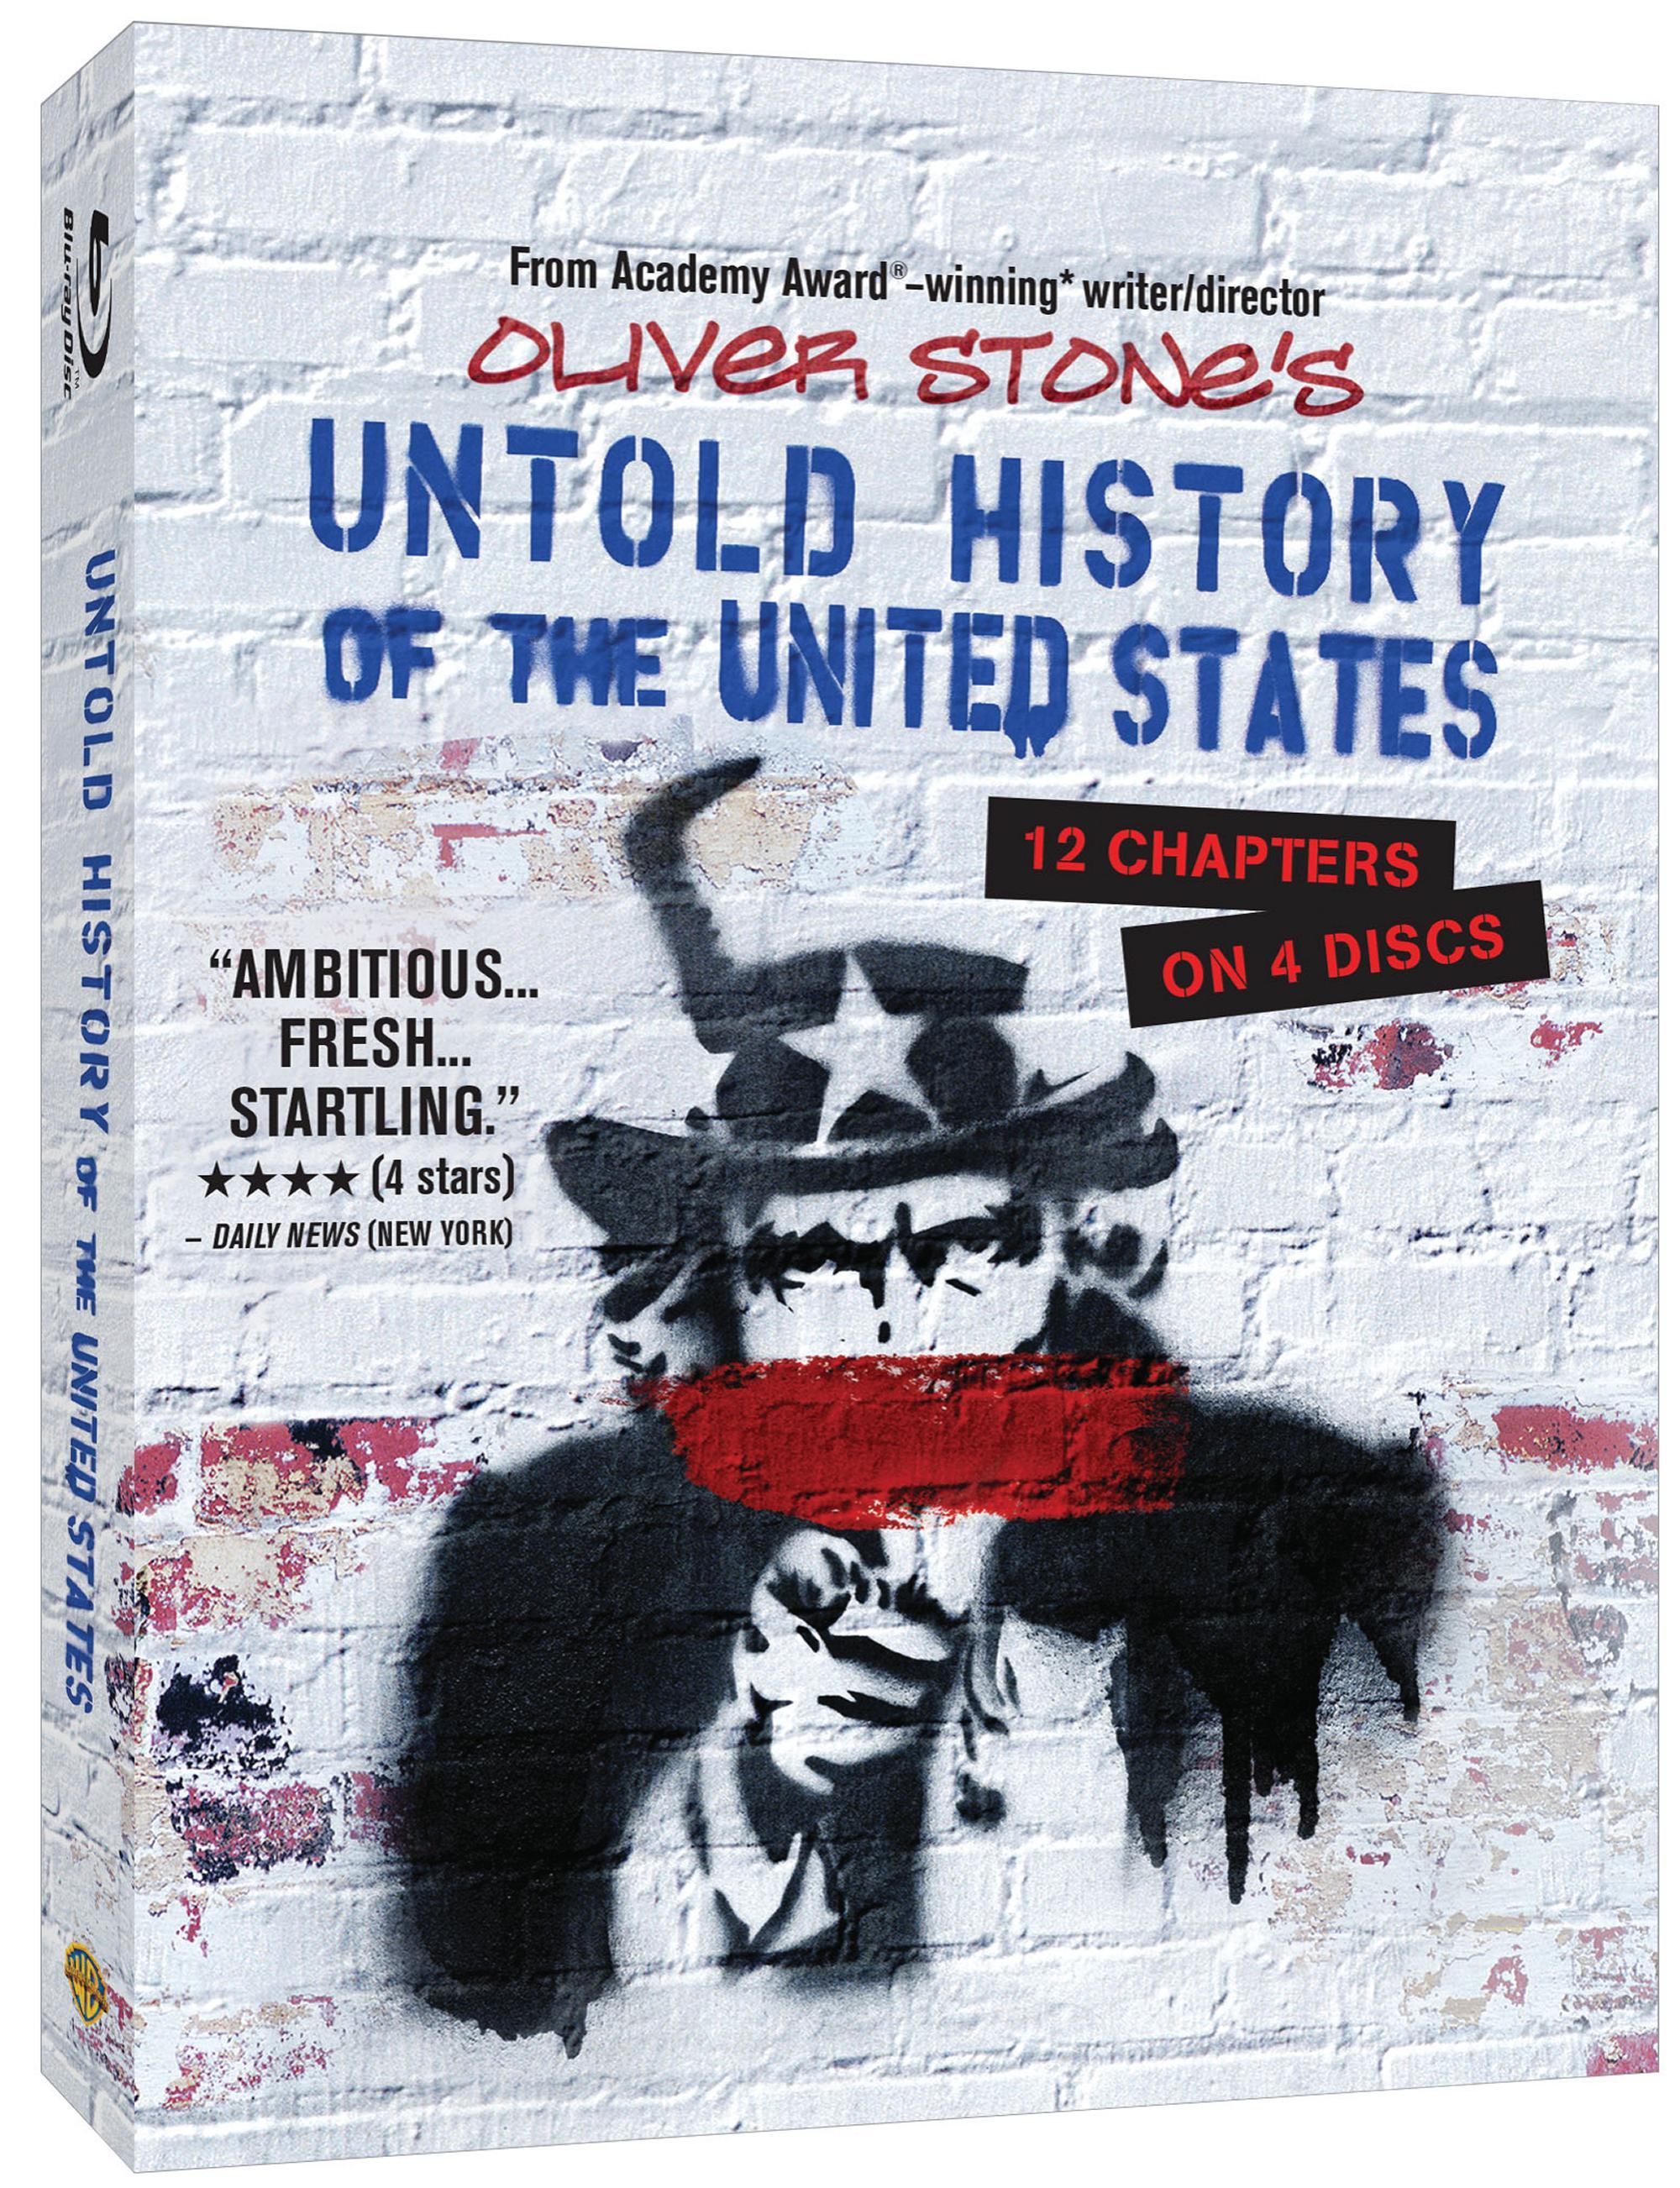 UntoldStoryoftheUnitedStates